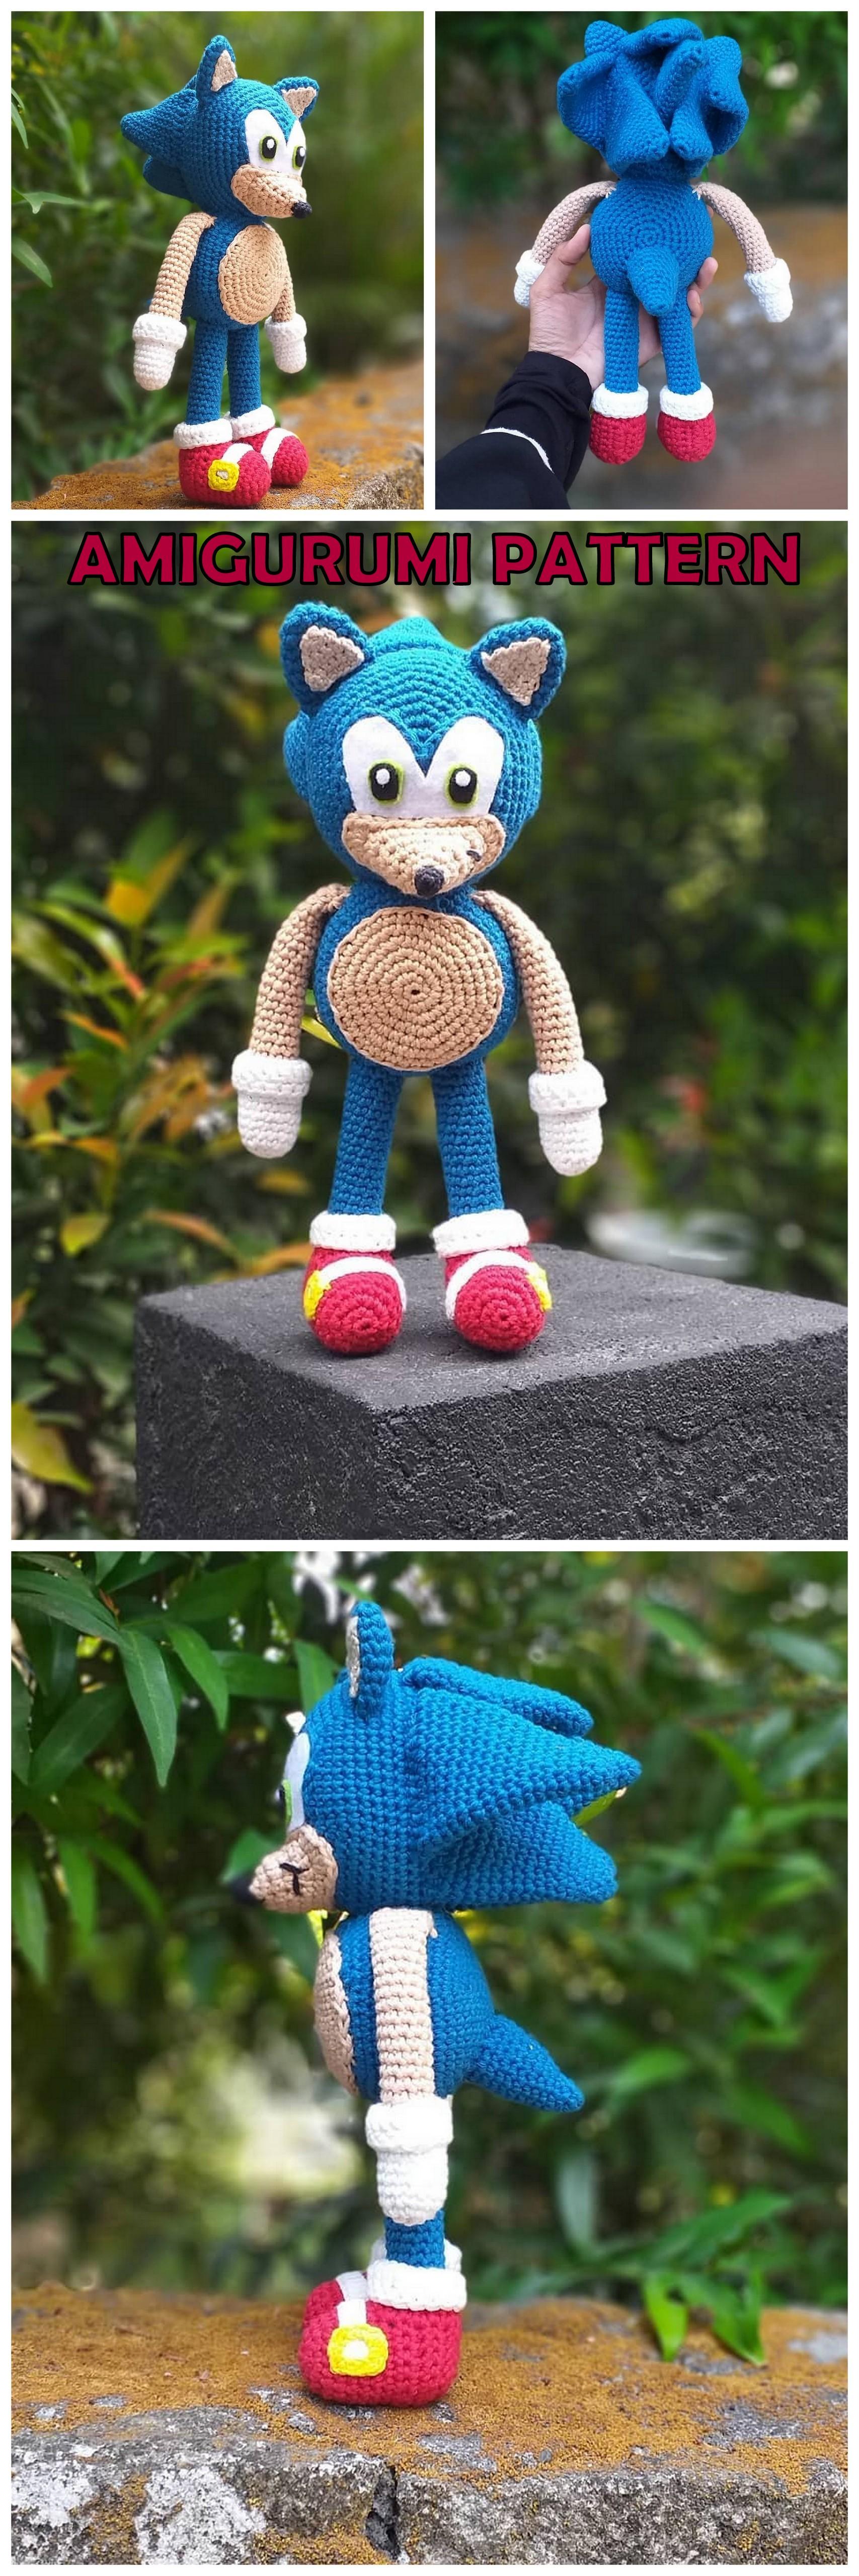 Best Amigurumi Doll Dog Bunny Bear Giraffe Animal Free Crochet Patterns